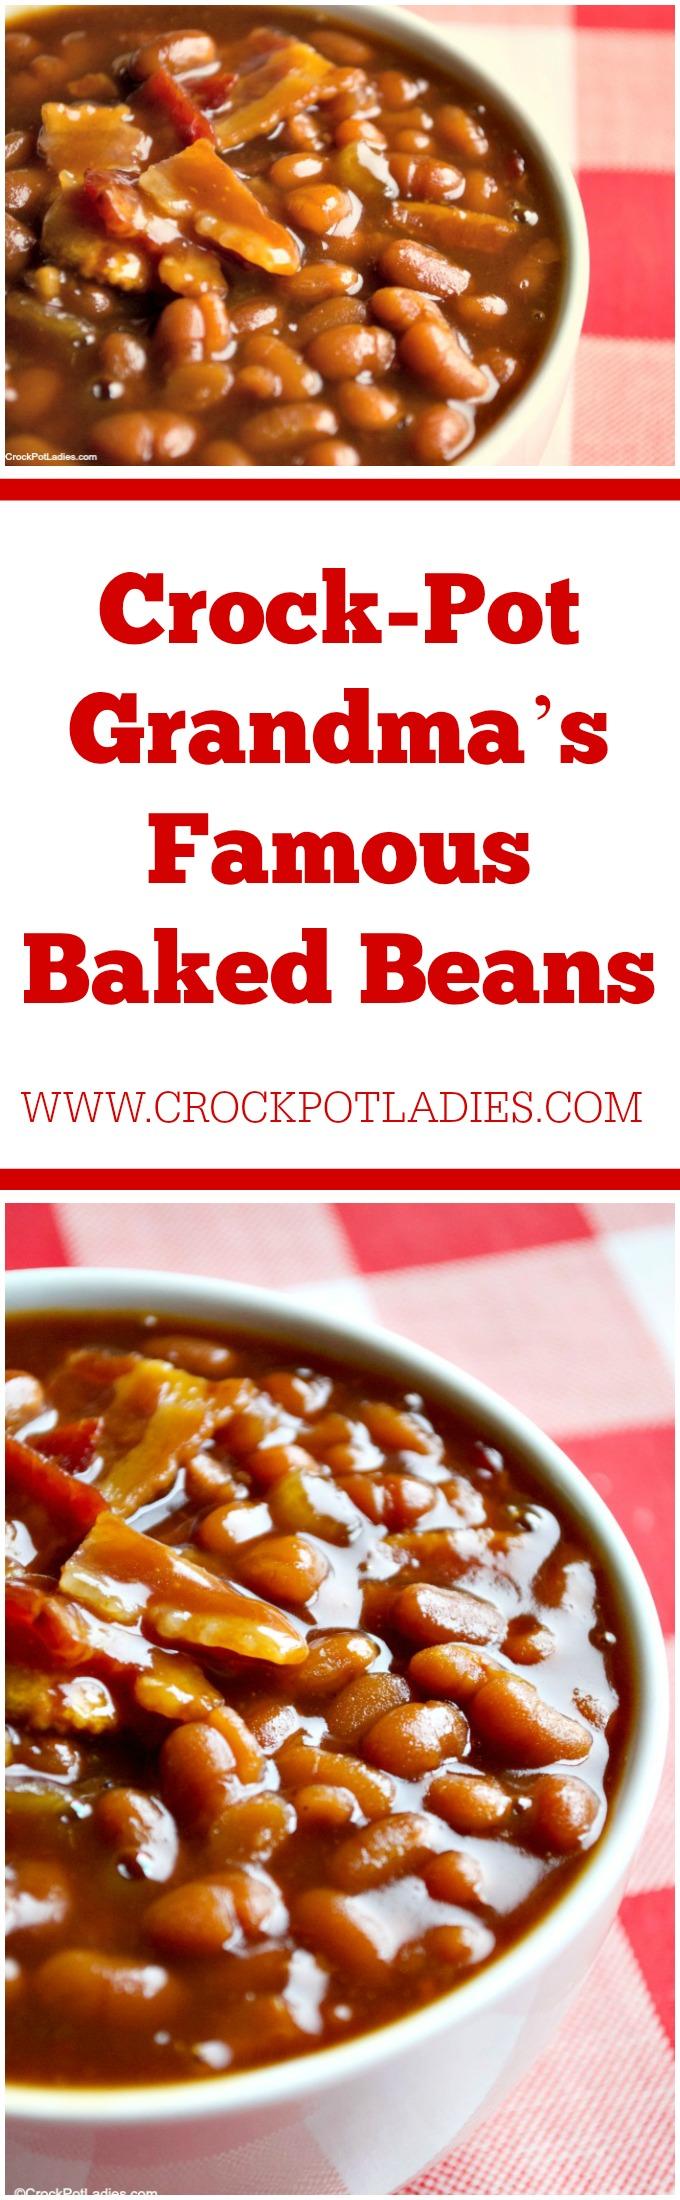 Crock-Pot Grandma's Famous Baked Beans